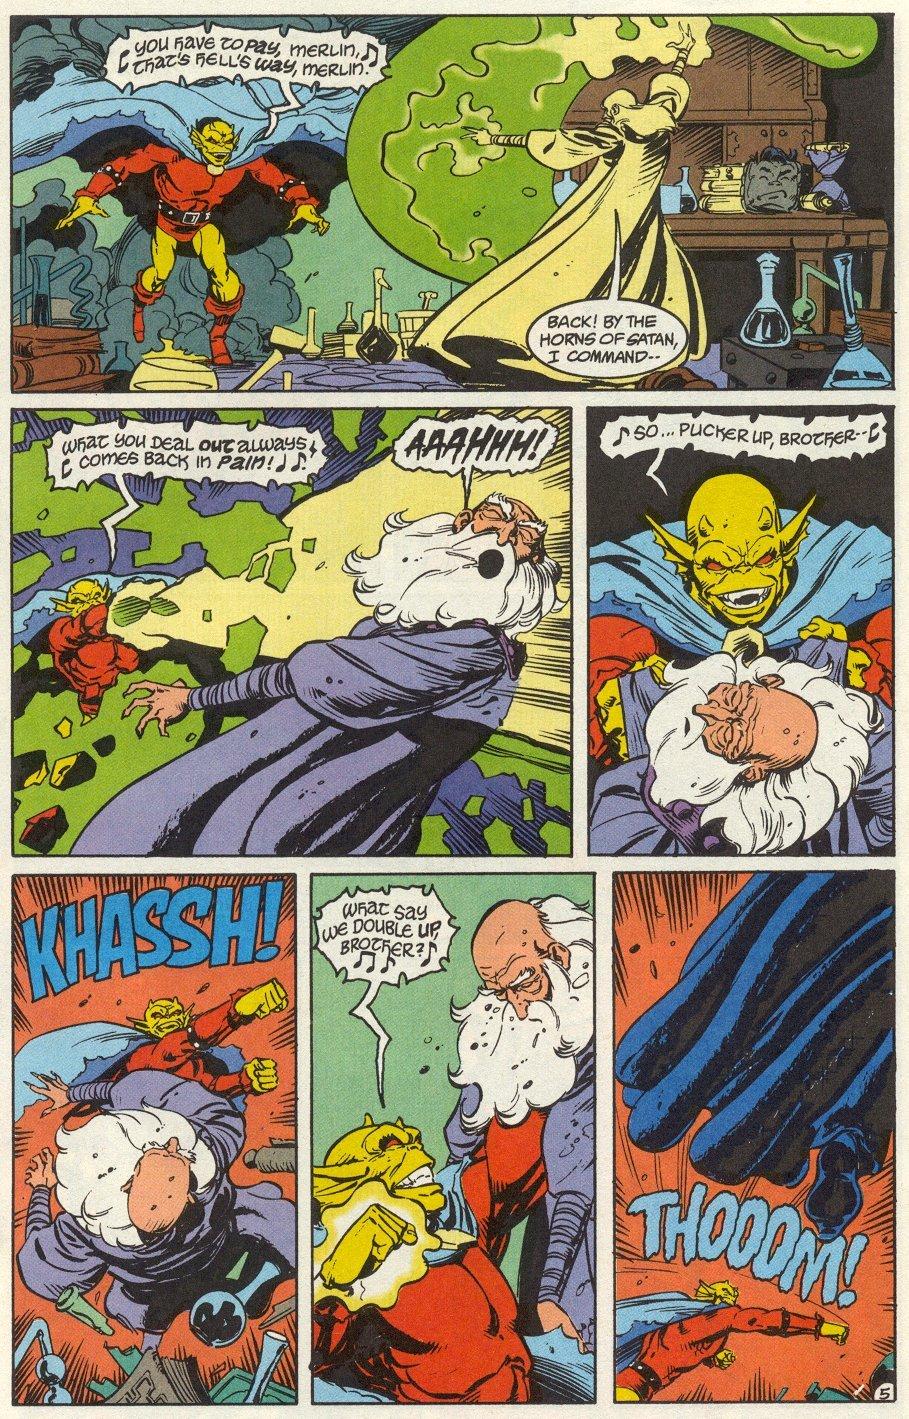 This time his magical blast breaks through Merlins magic shield